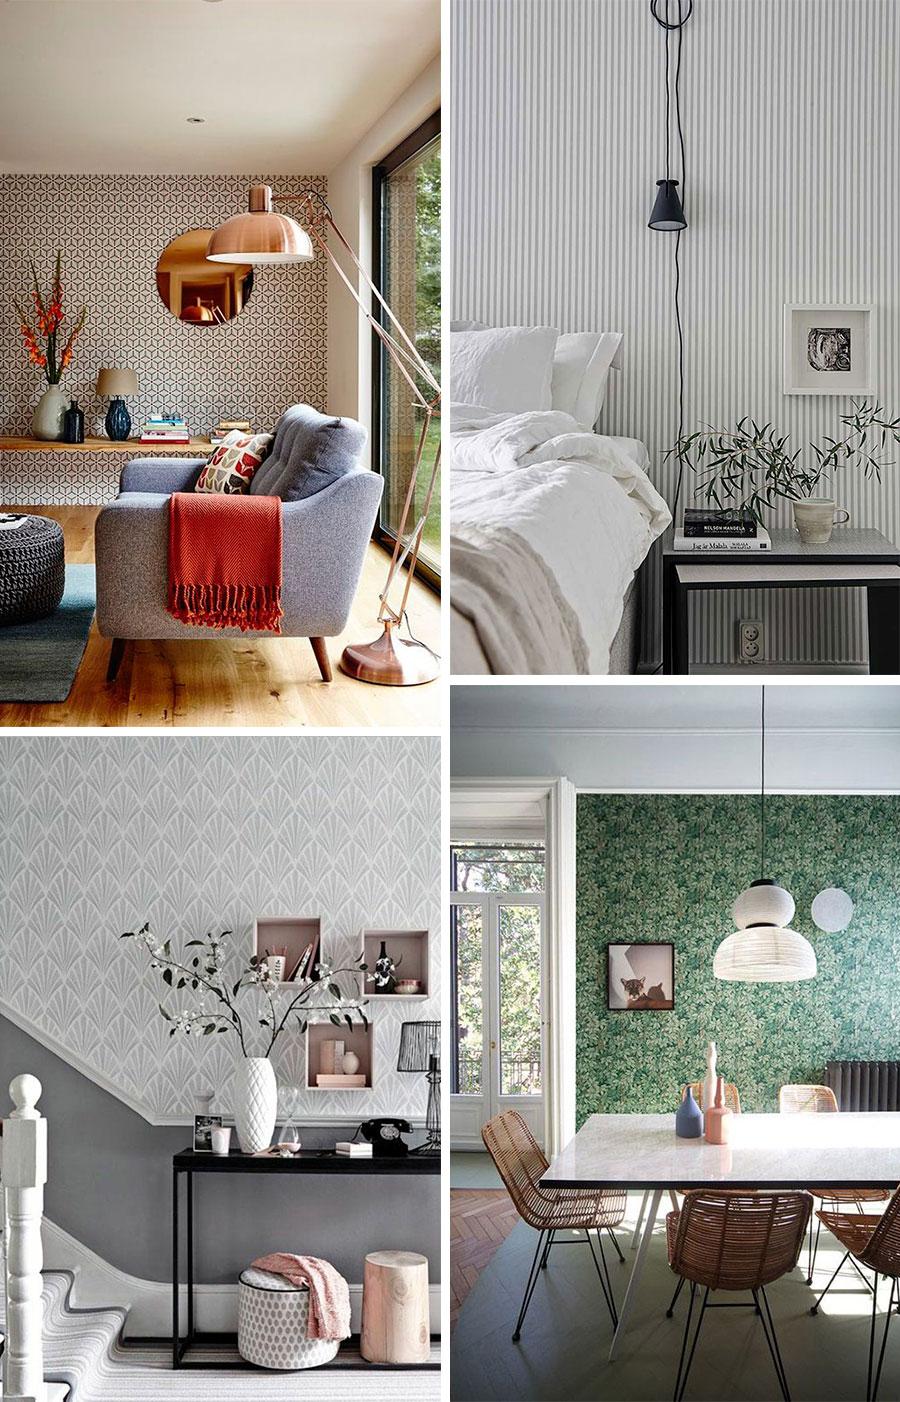 Blog de moda y lifestyle decorar con papel pintado - Decorar papel pintado ...